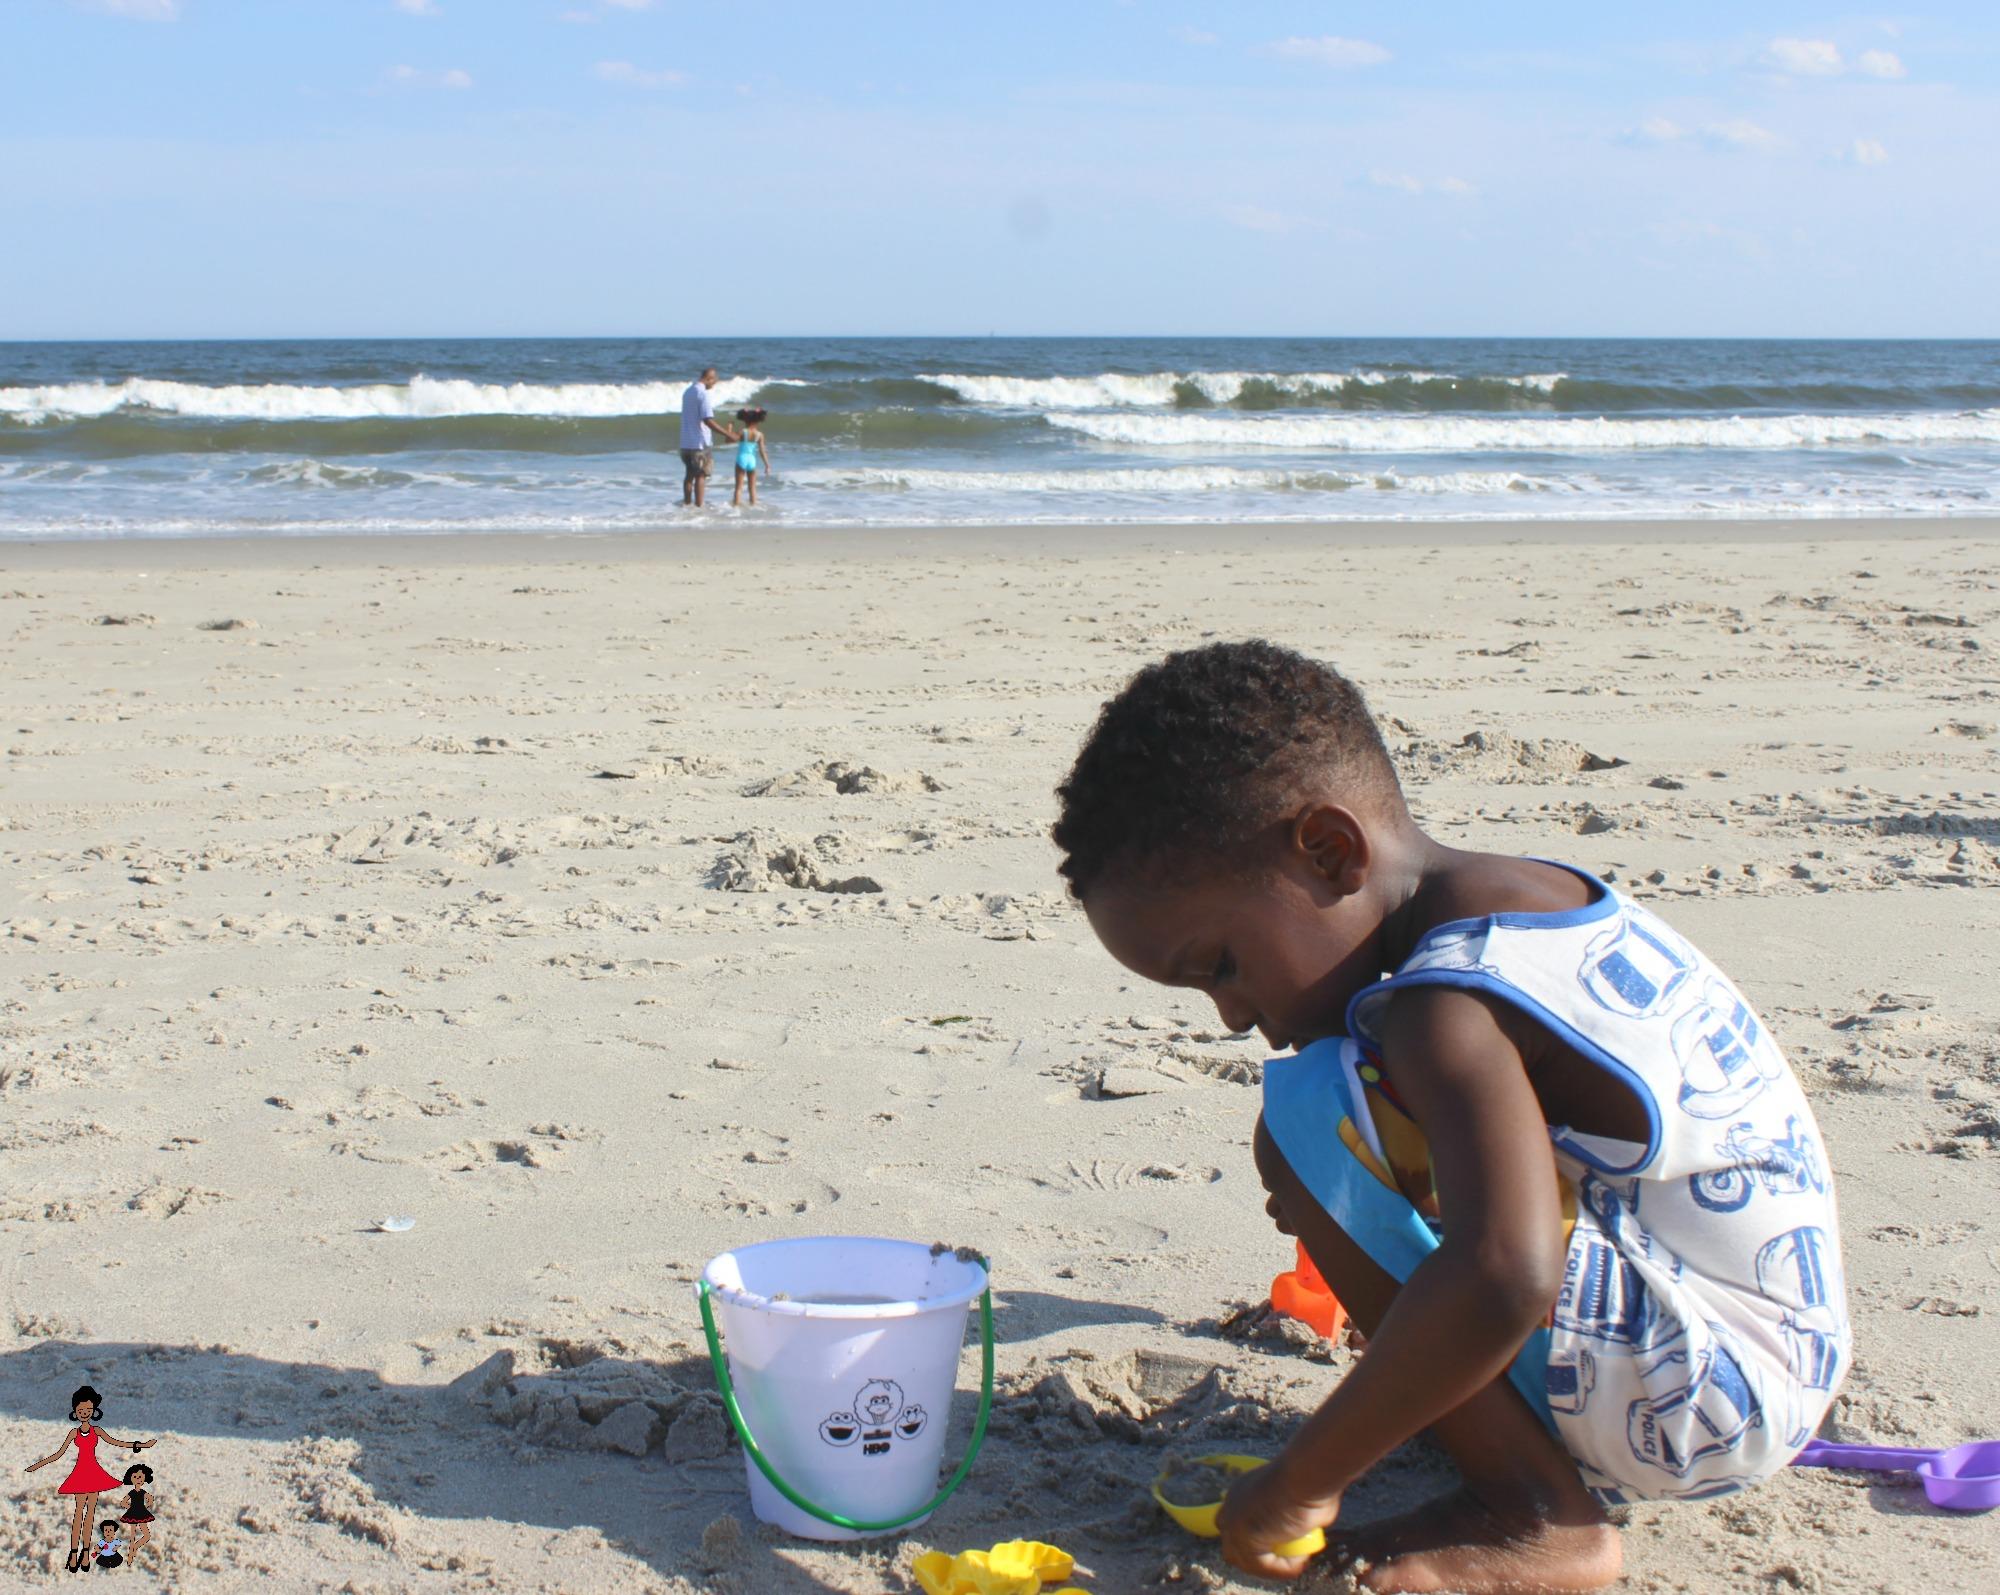 Summer Family Fun Beach Tips